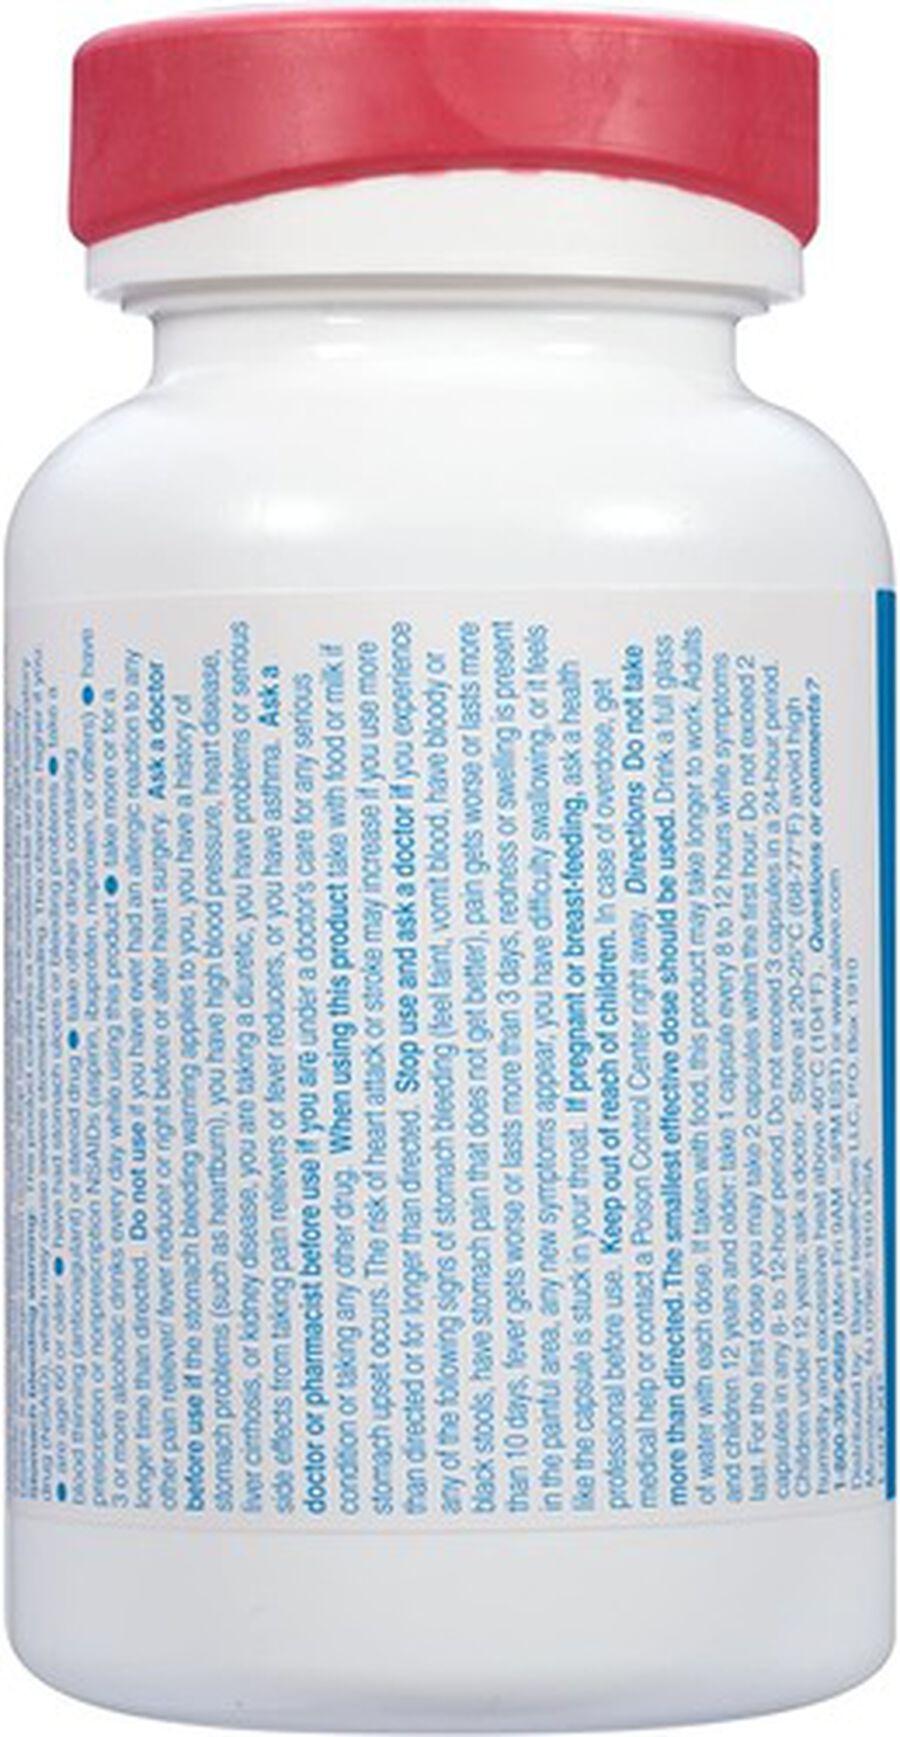 Aleve Arthritis Liquid Gels, Easy Open Cap, 80ct, , large image number 5